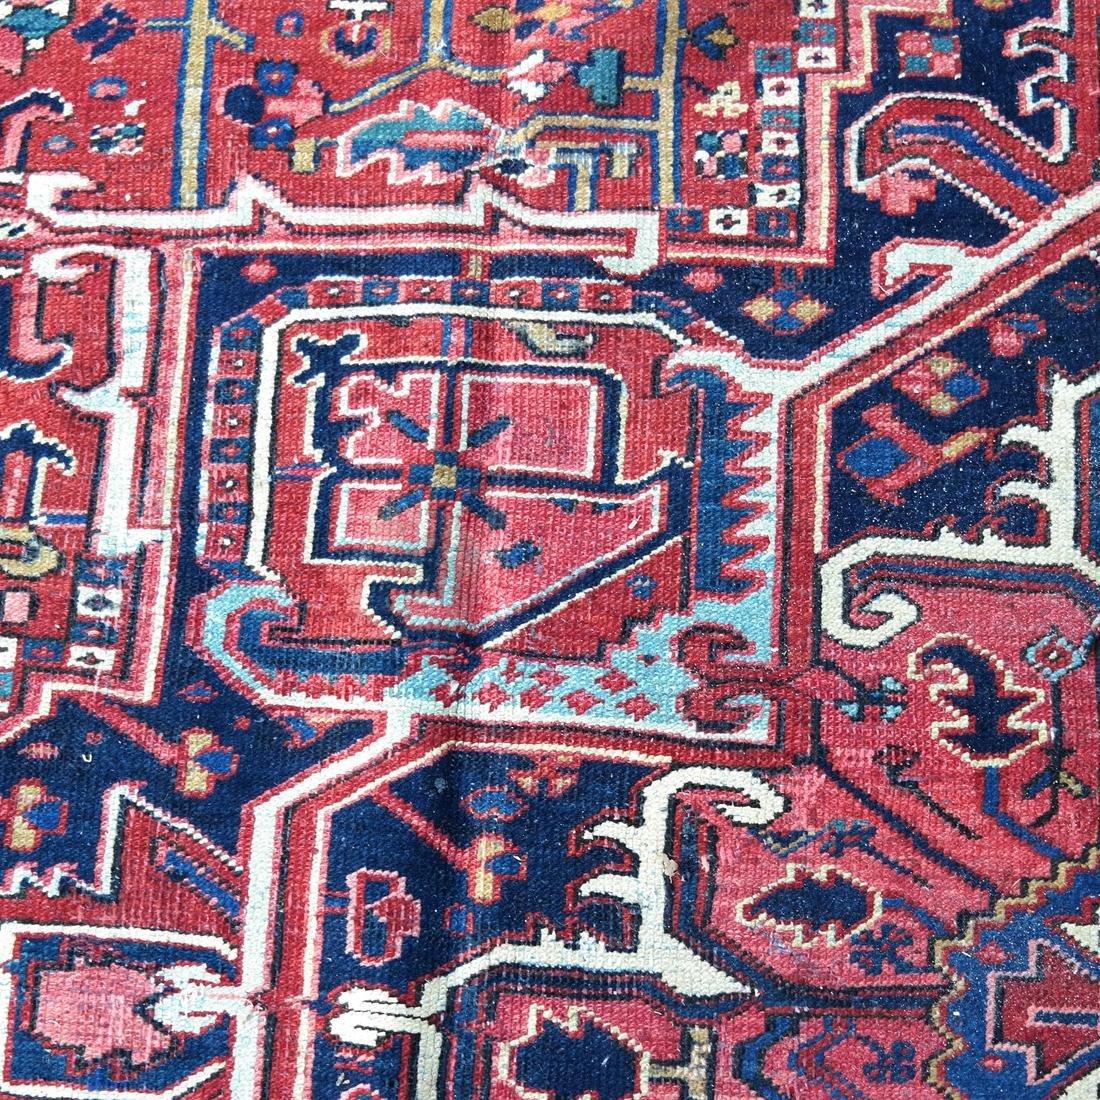 Antique Iranian Heriz Carpet, 9 x 12 - 5